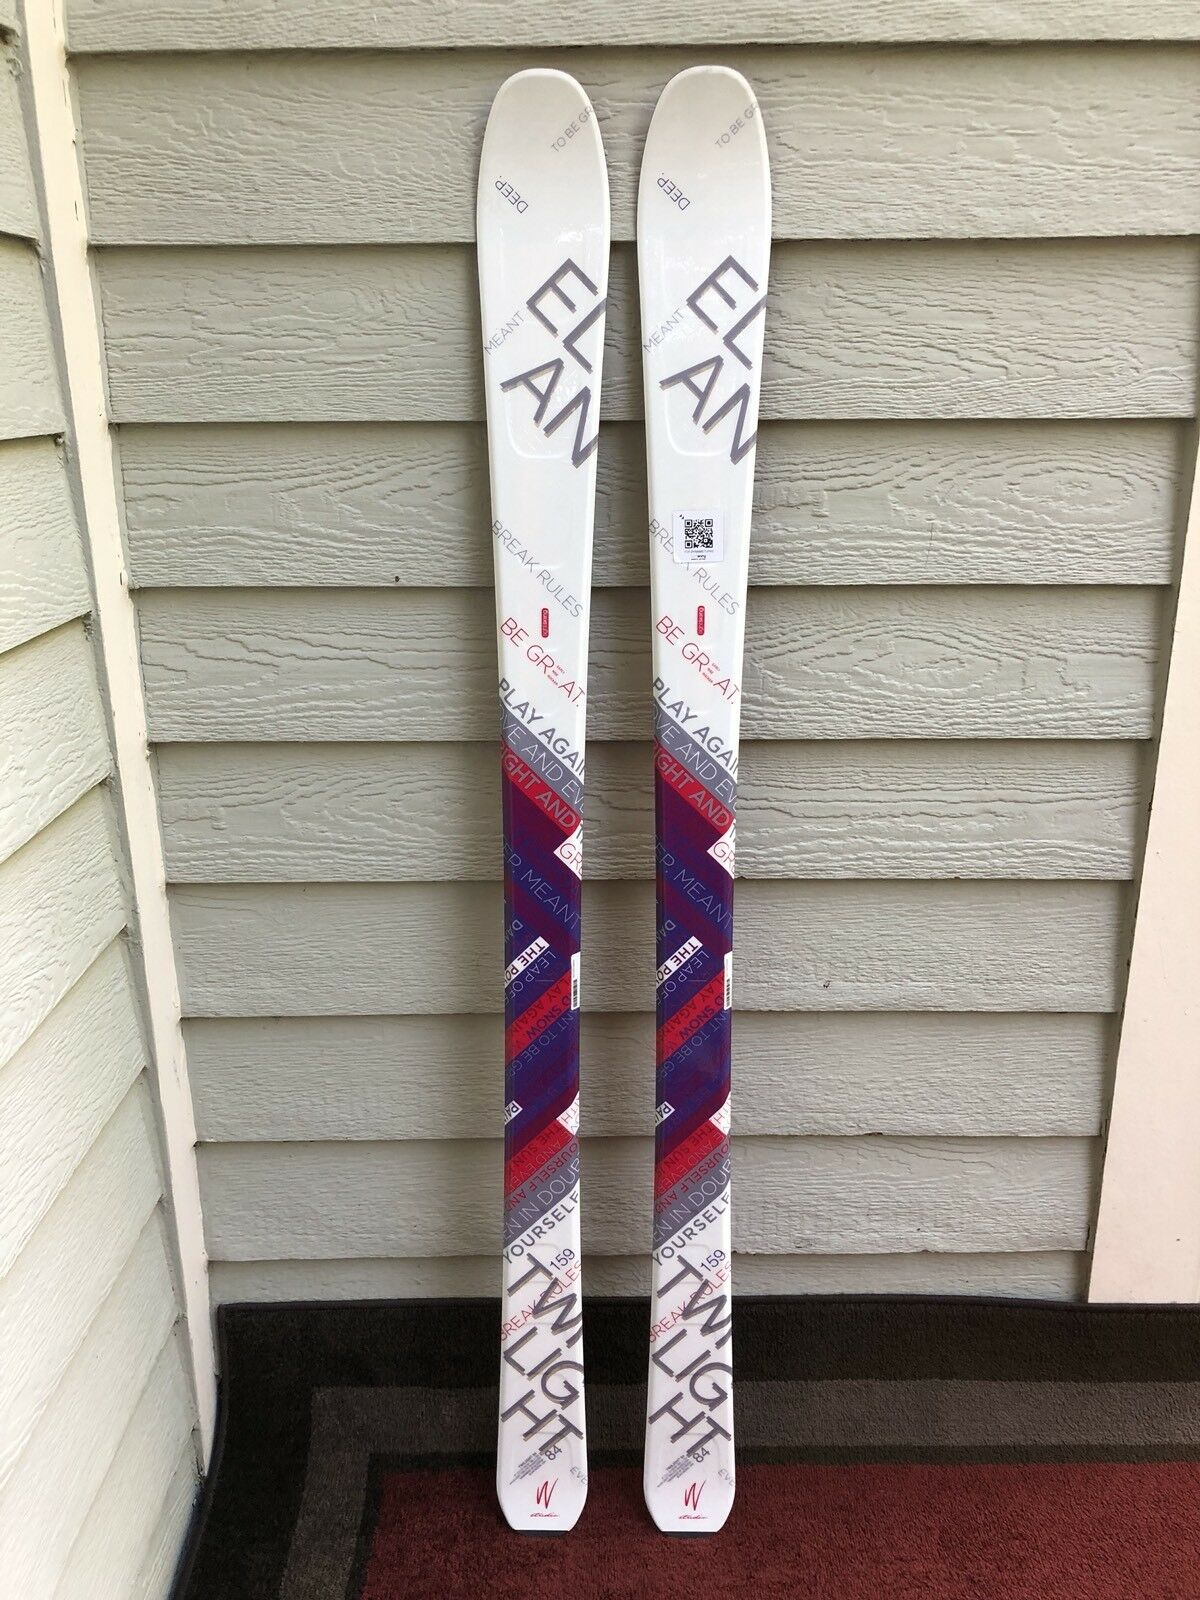 Elan 159 cm Twilight 84 Woherrar All Mountain åka skidors NY